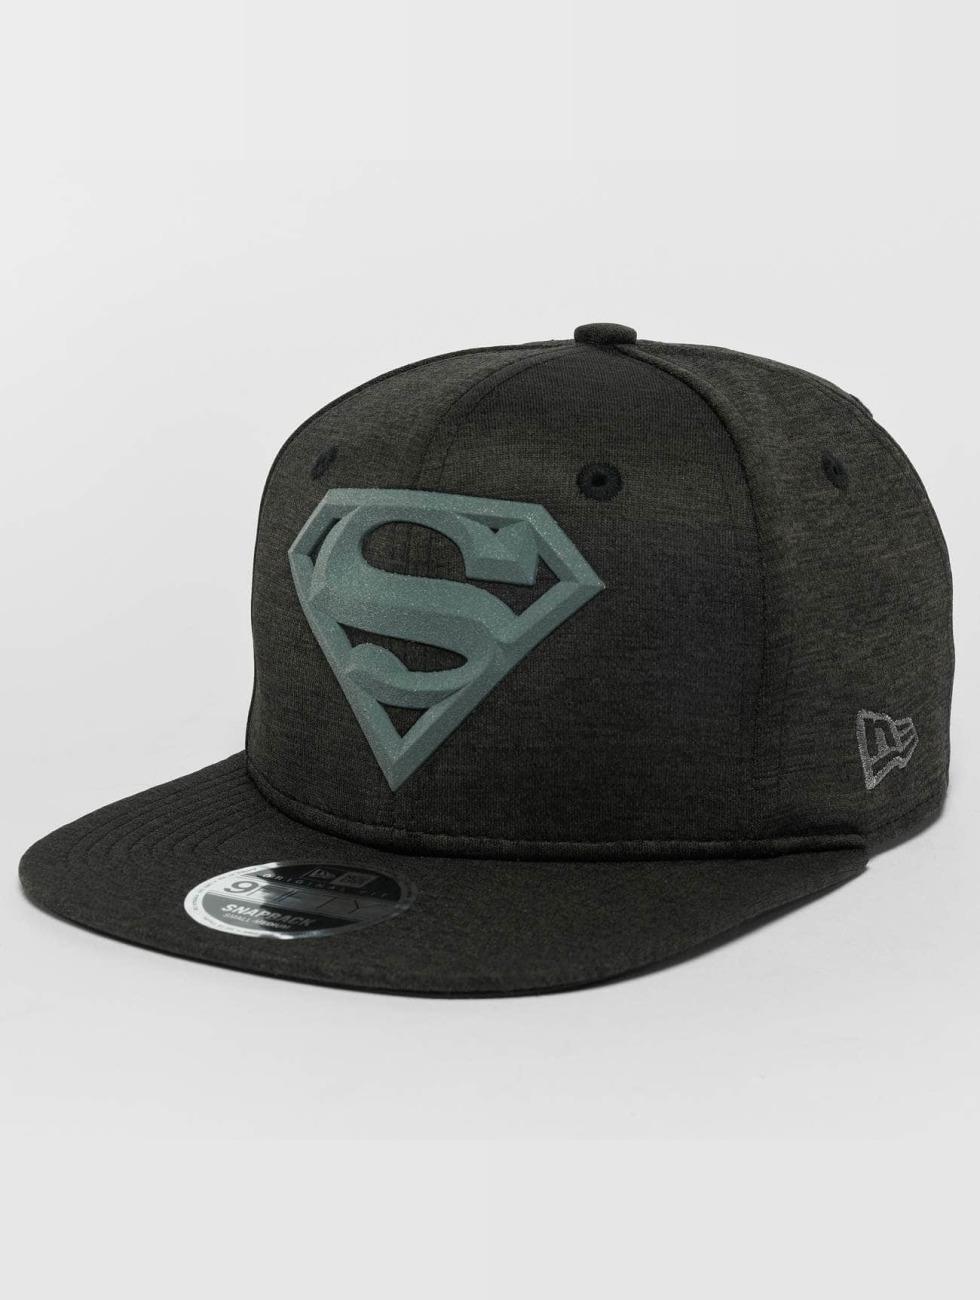 New Era Snapback Cap Concrete Jersey Superman 9Fifty black